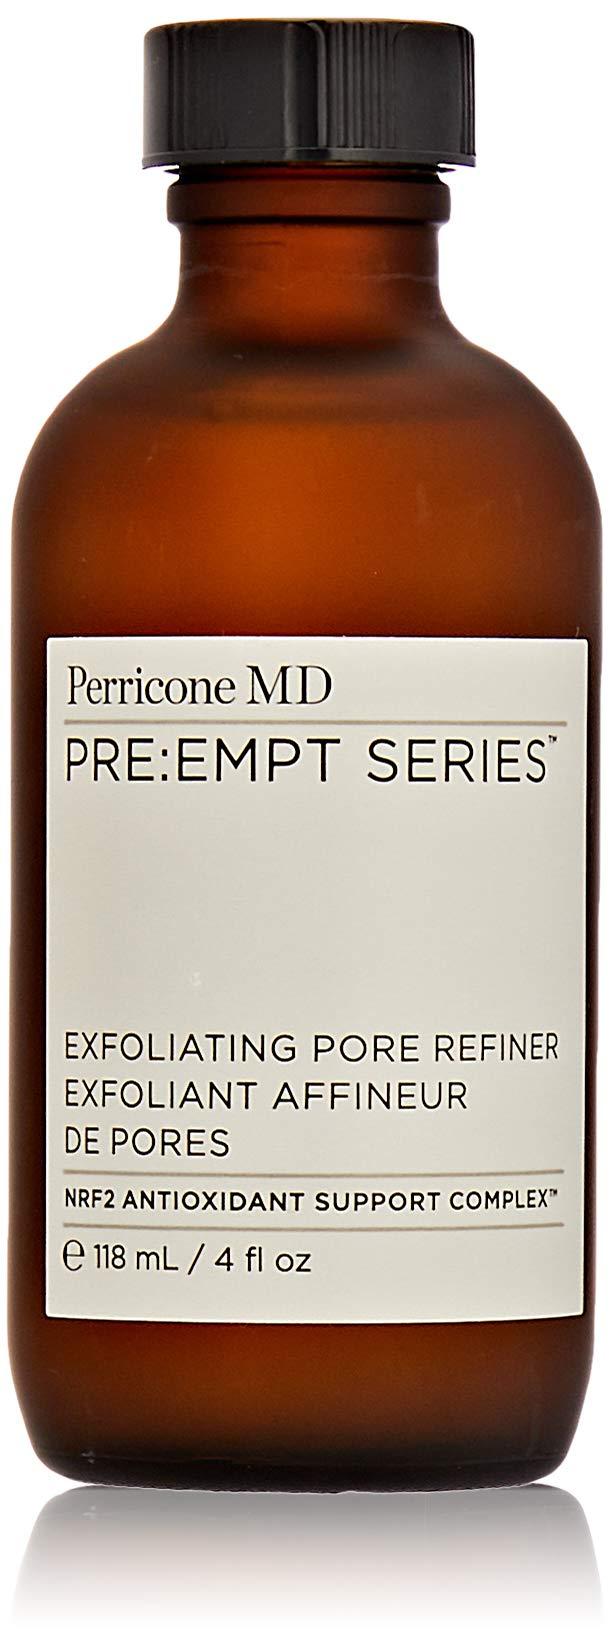 Perricone M.D. Pre:Empt Series Exfoliating Pore Refiner, 4 Ounce